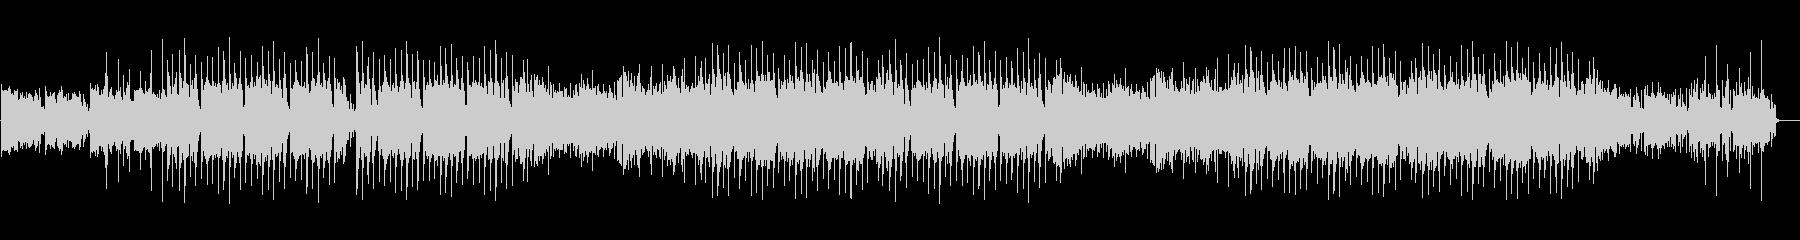 KPOP・ファンク・アウトドア・楽しいの未再生の波形